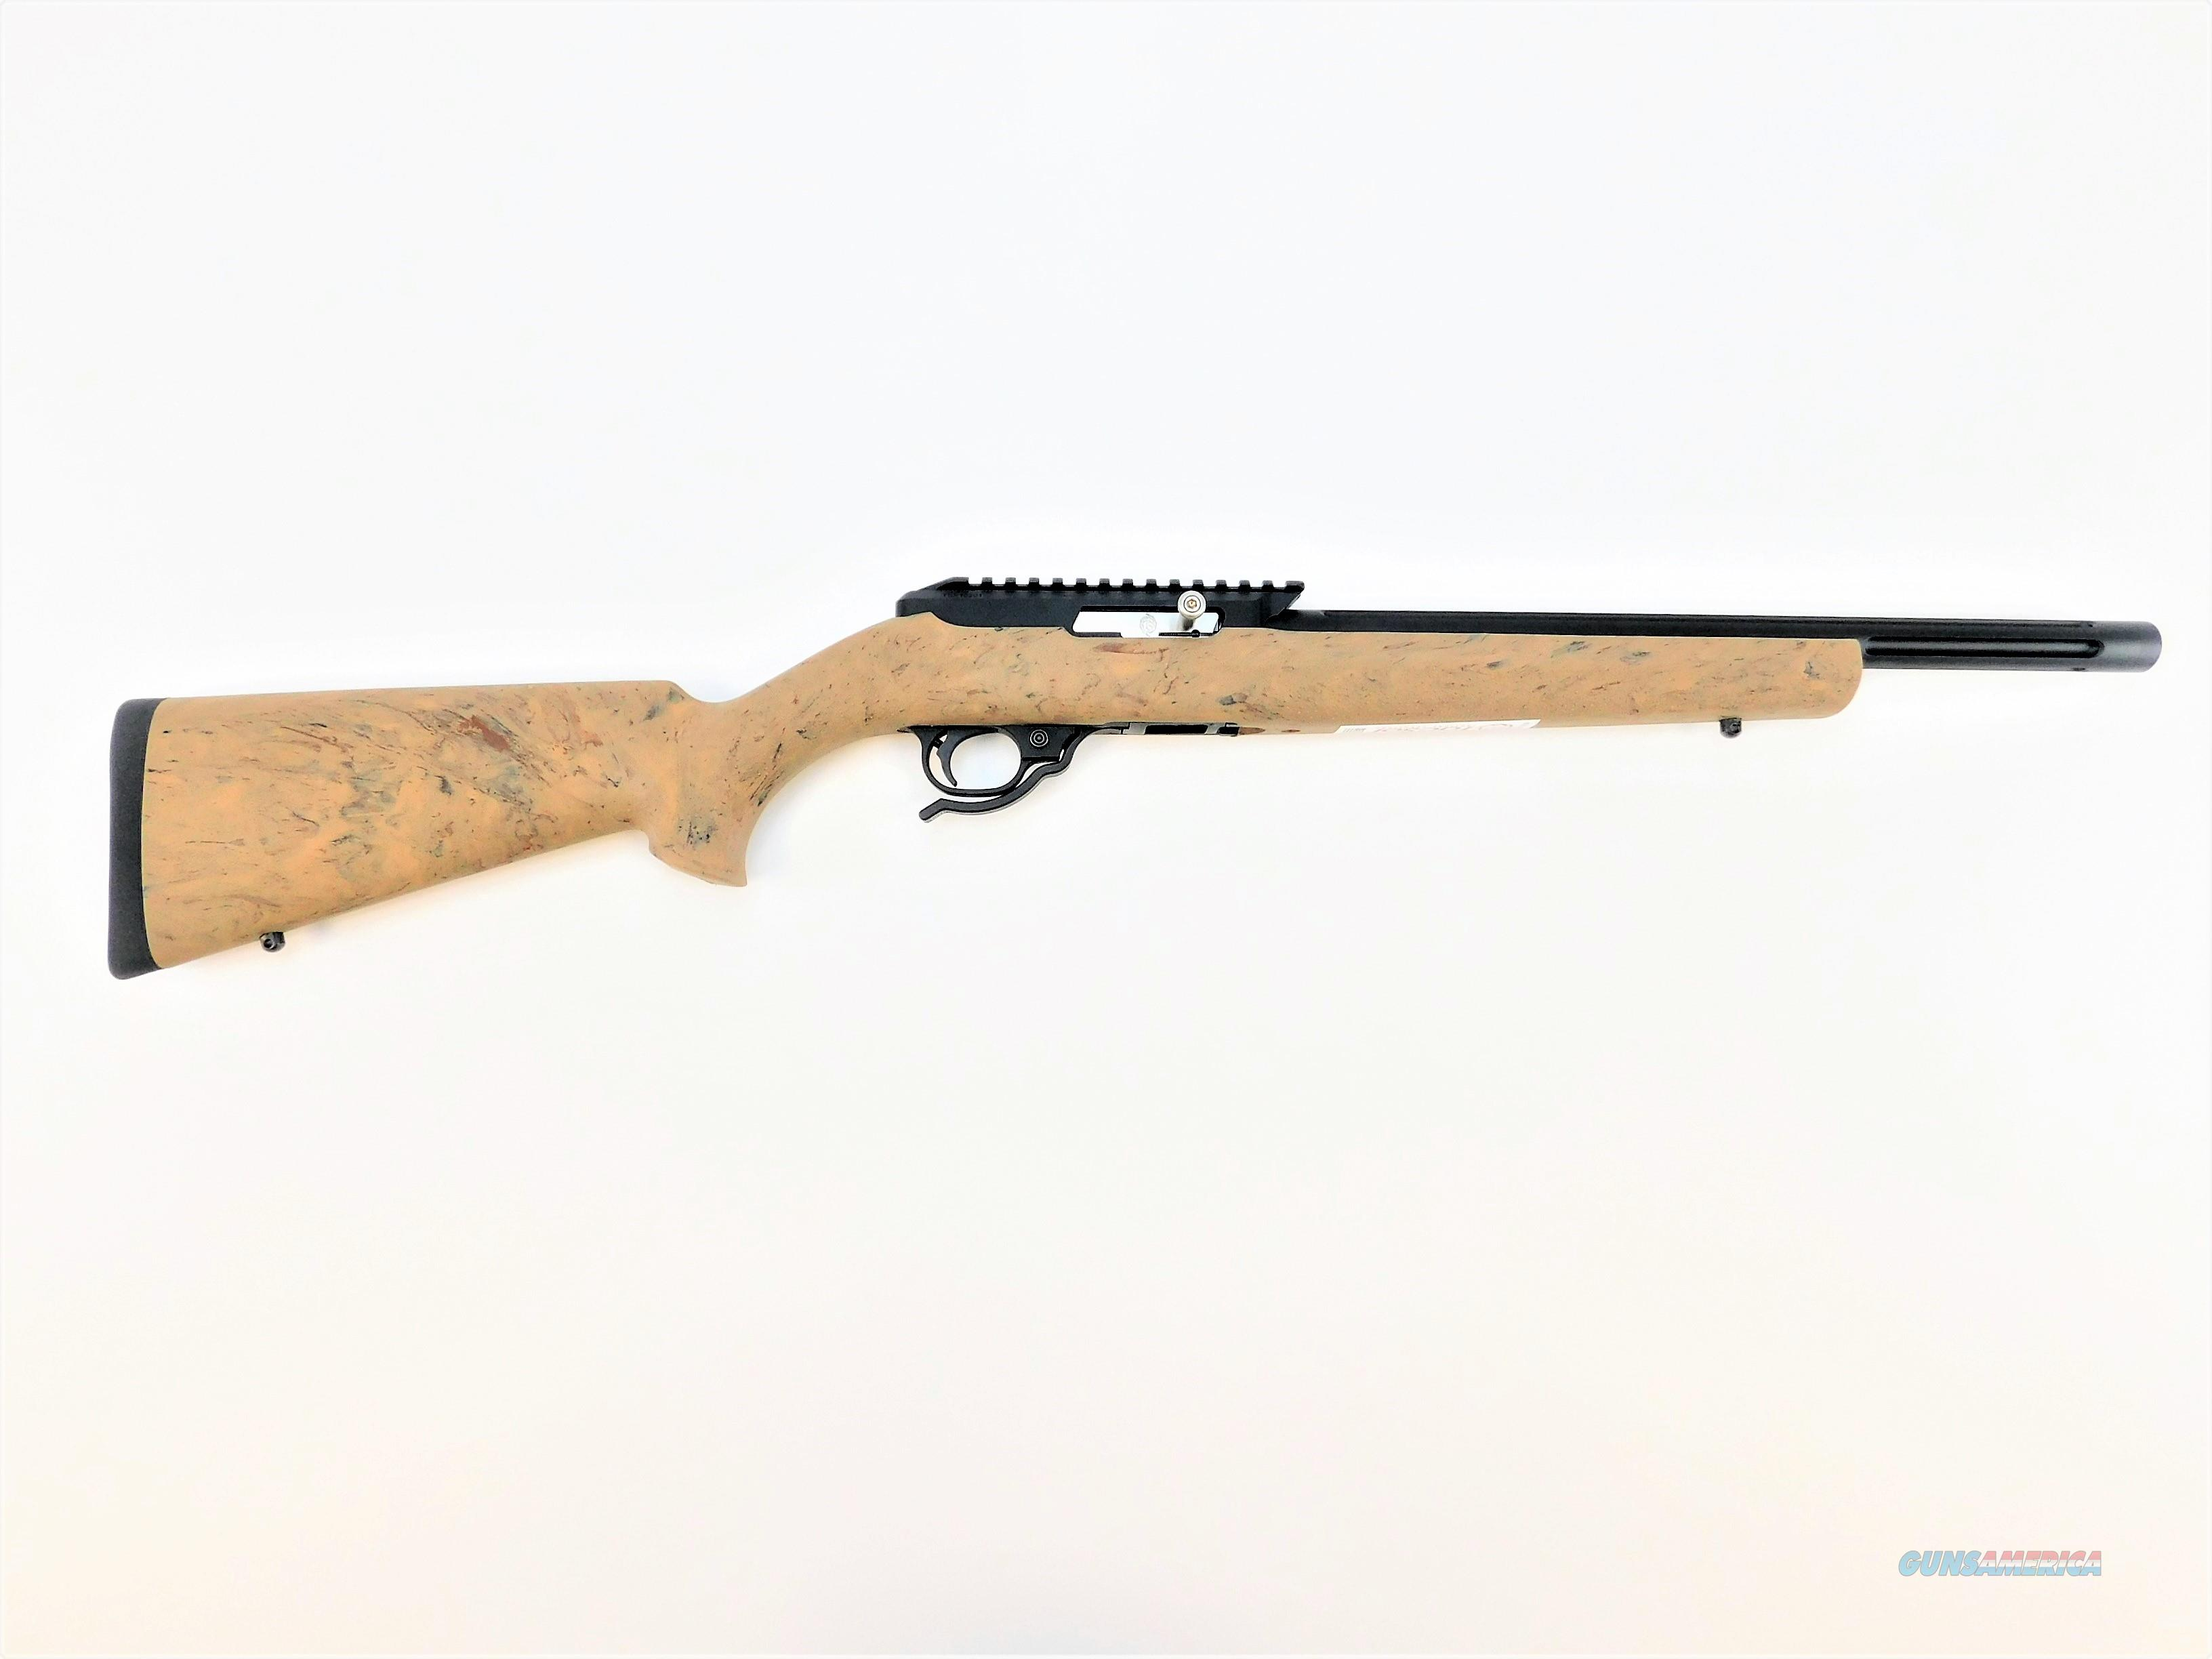 TACTICAL SOLUTIONS X-RING RIFLE HOGUE GTAN MATTE BLACK 10/22 .22LR TE-MB-B-H-GTAN   Guns > Rifles > Ruger Rifles > 10-22